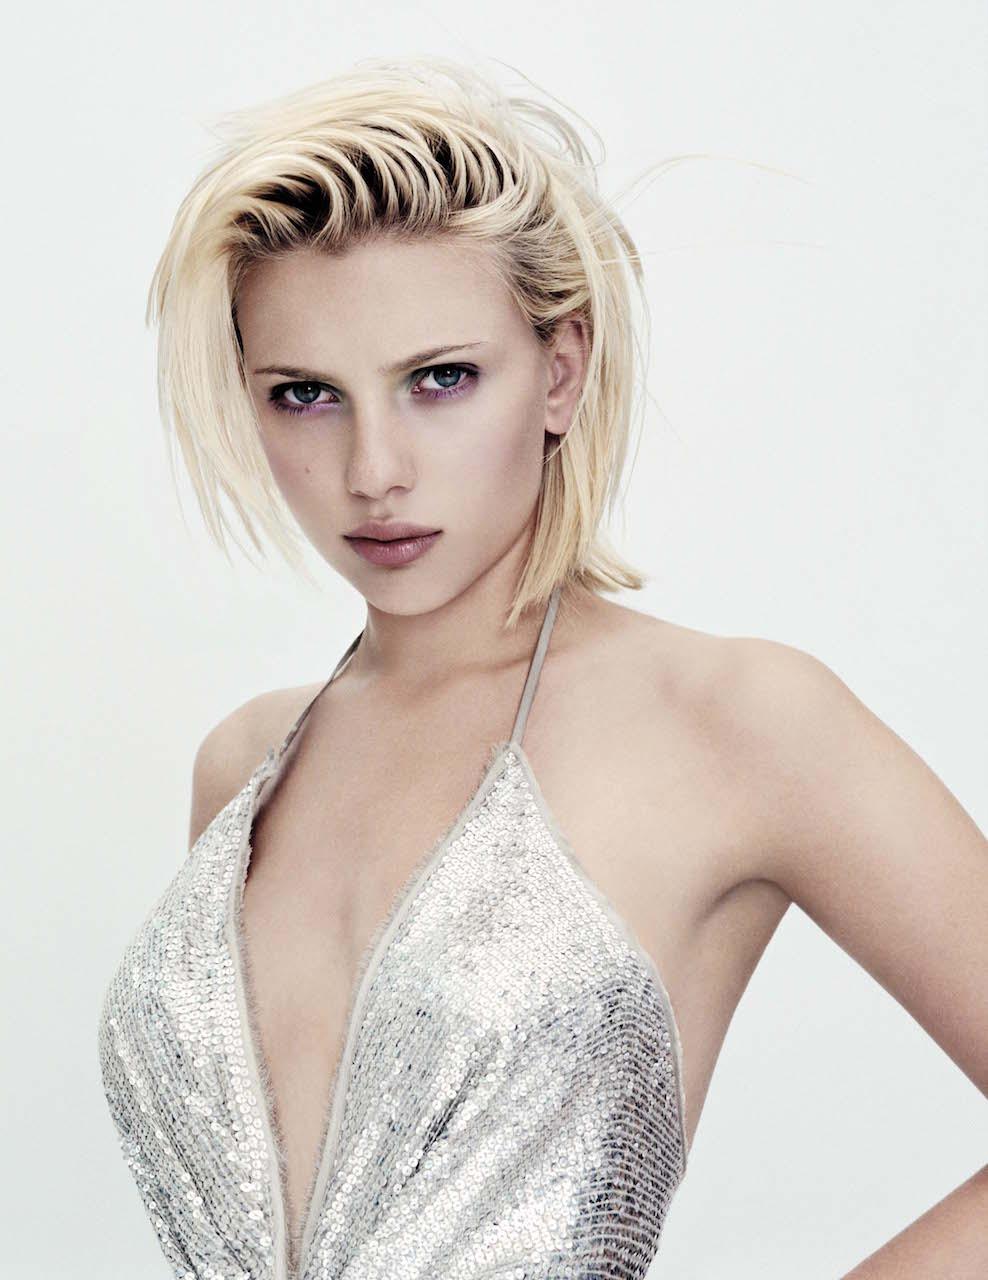 Vogue-09_v1-RGBFinal.jpeg